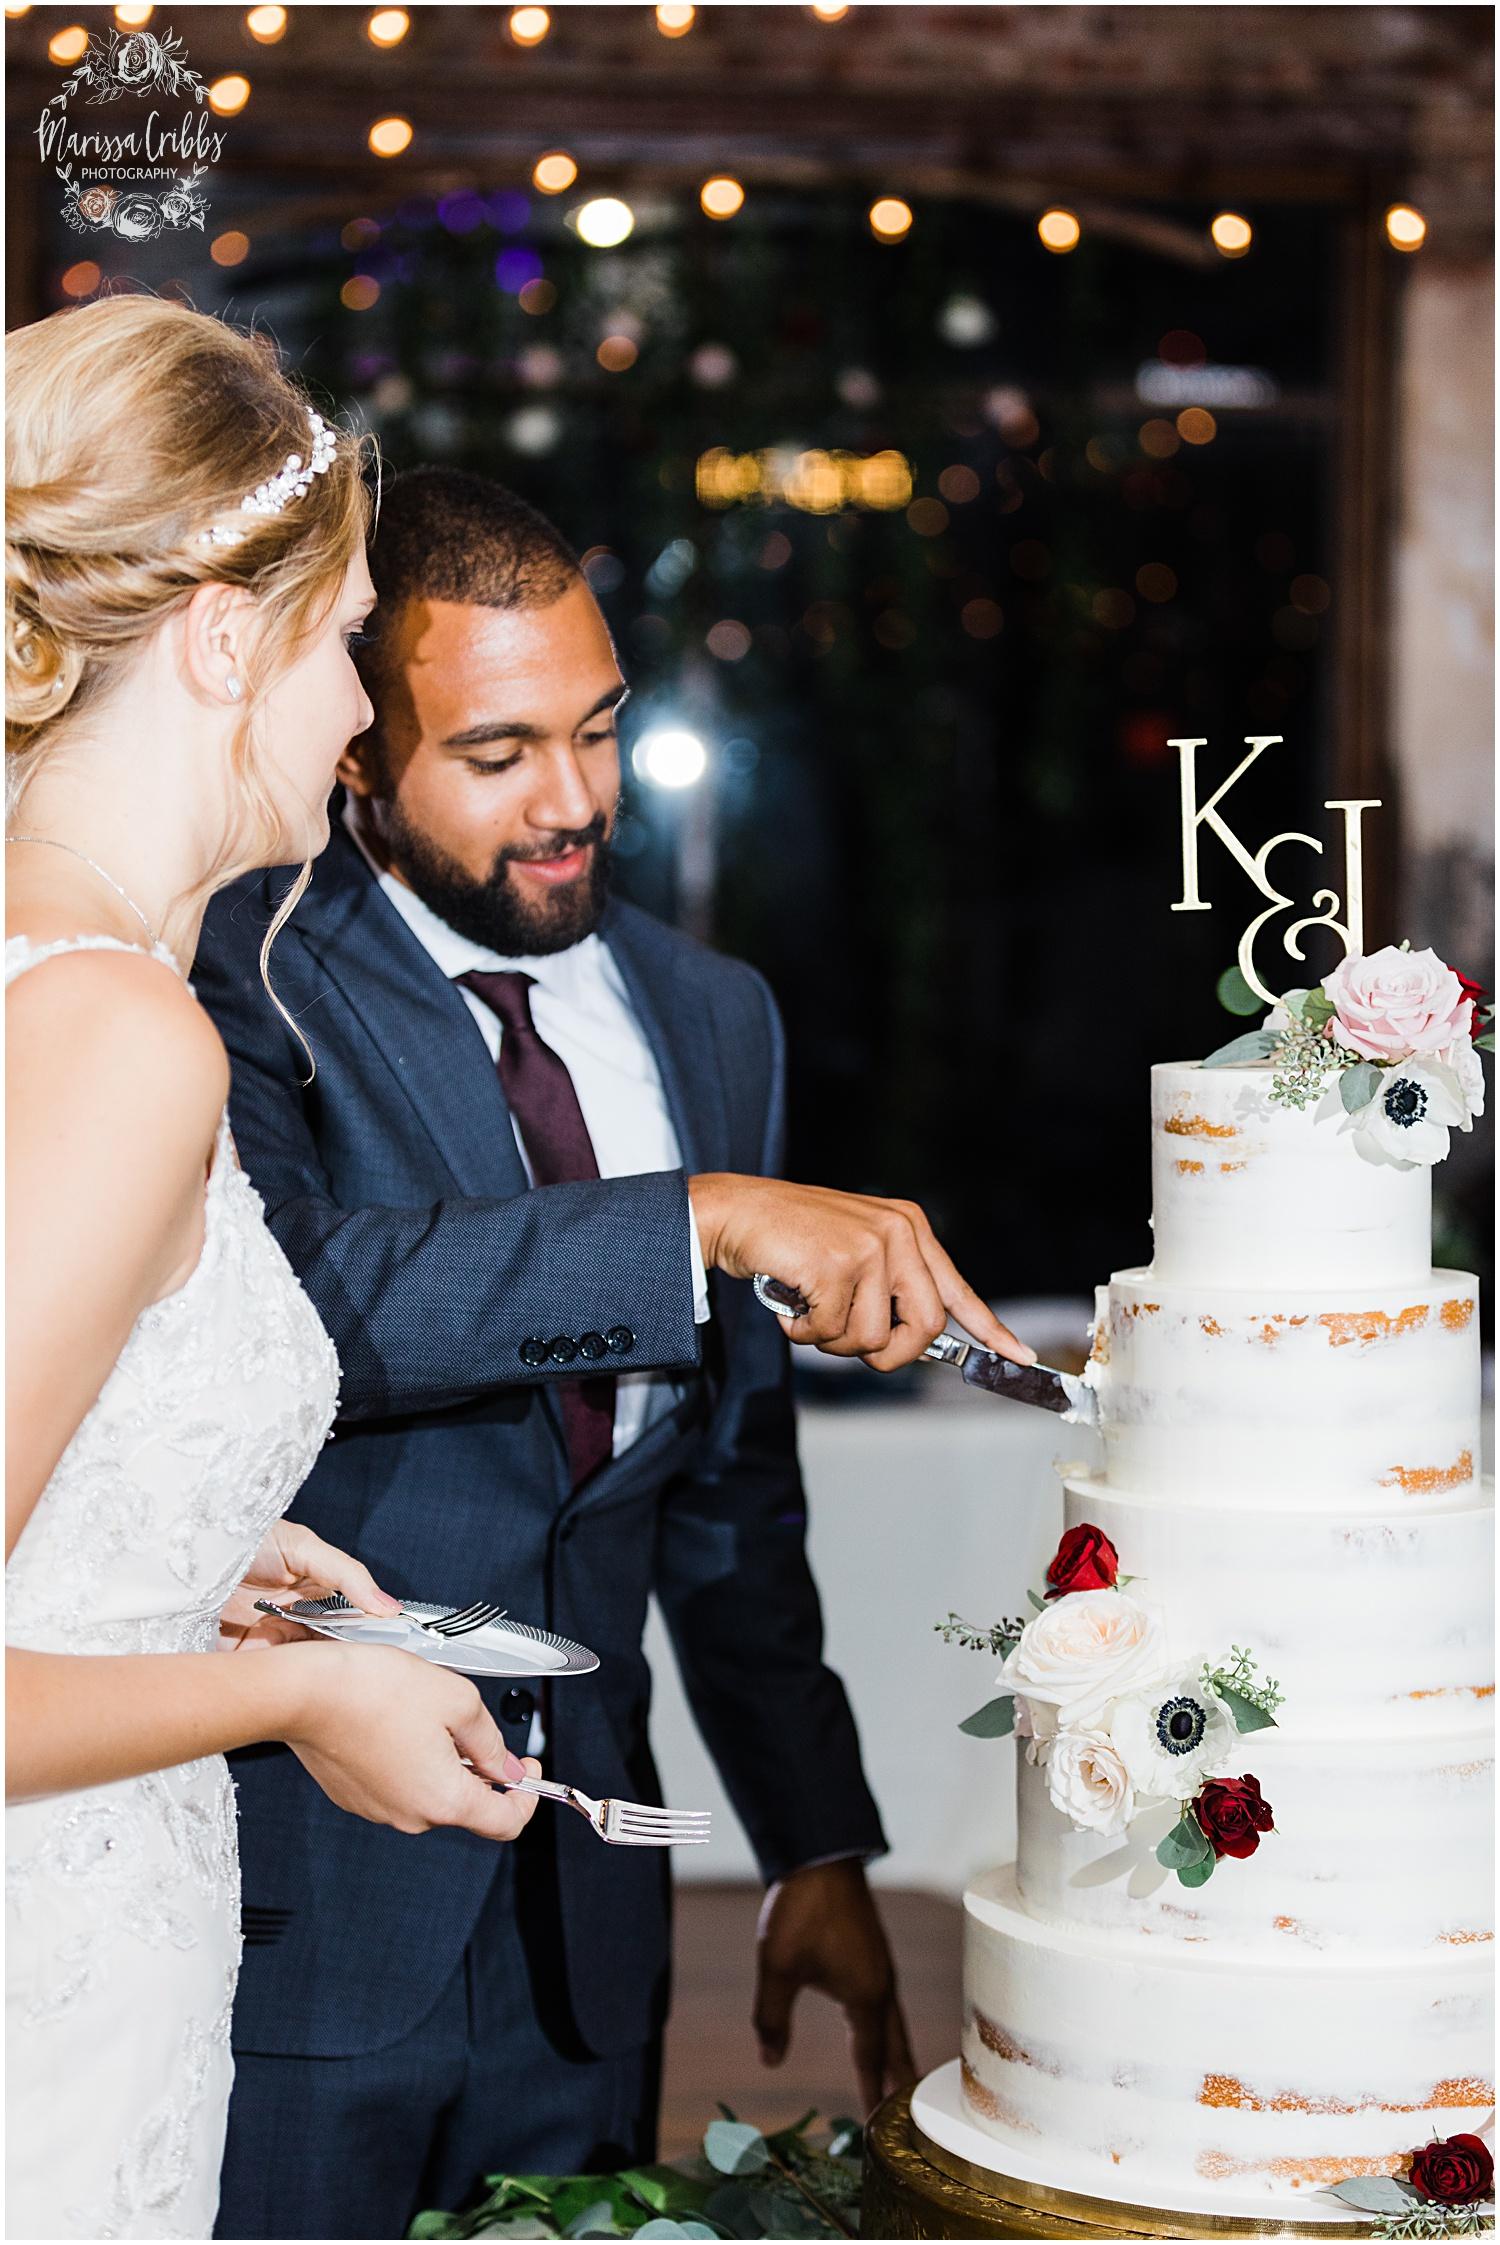 BAUER WEDDING   KELSEA & JUSTIN   MARISSA CRIBBS PHOTOGRAPHY_6586.jpg